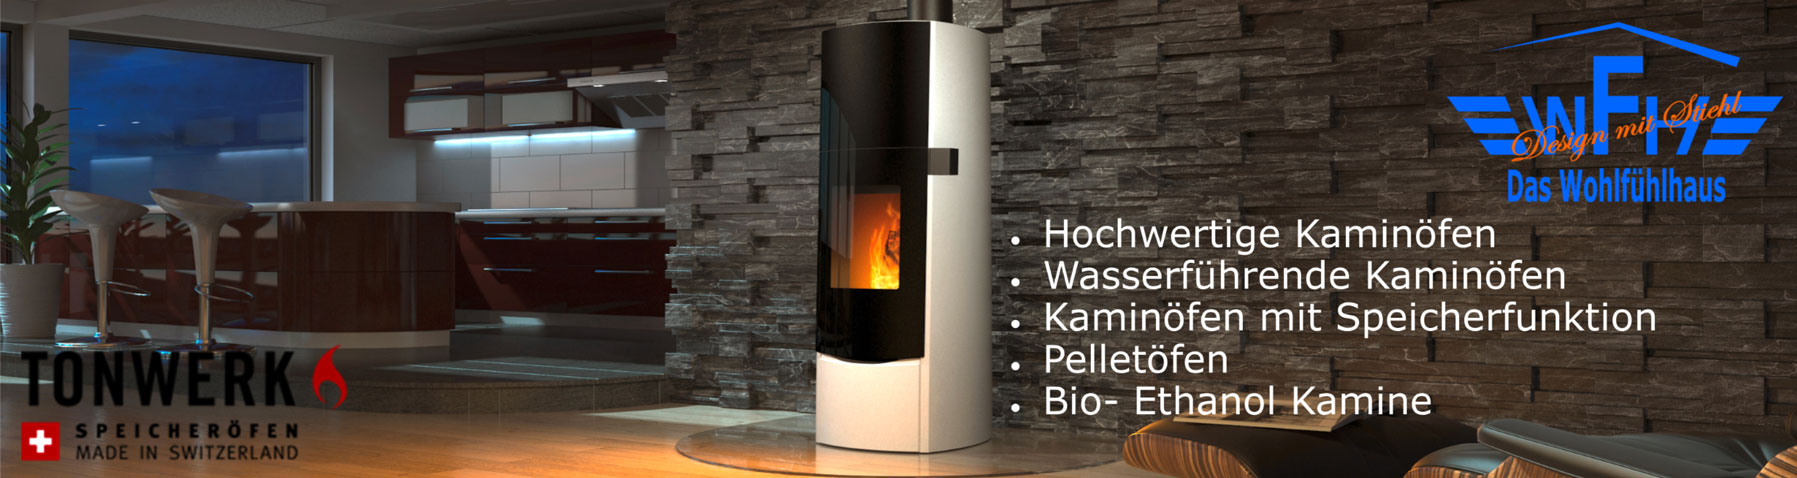 Kaminöfen-Kaminofen-Tonwerk-T-Sky-eco2